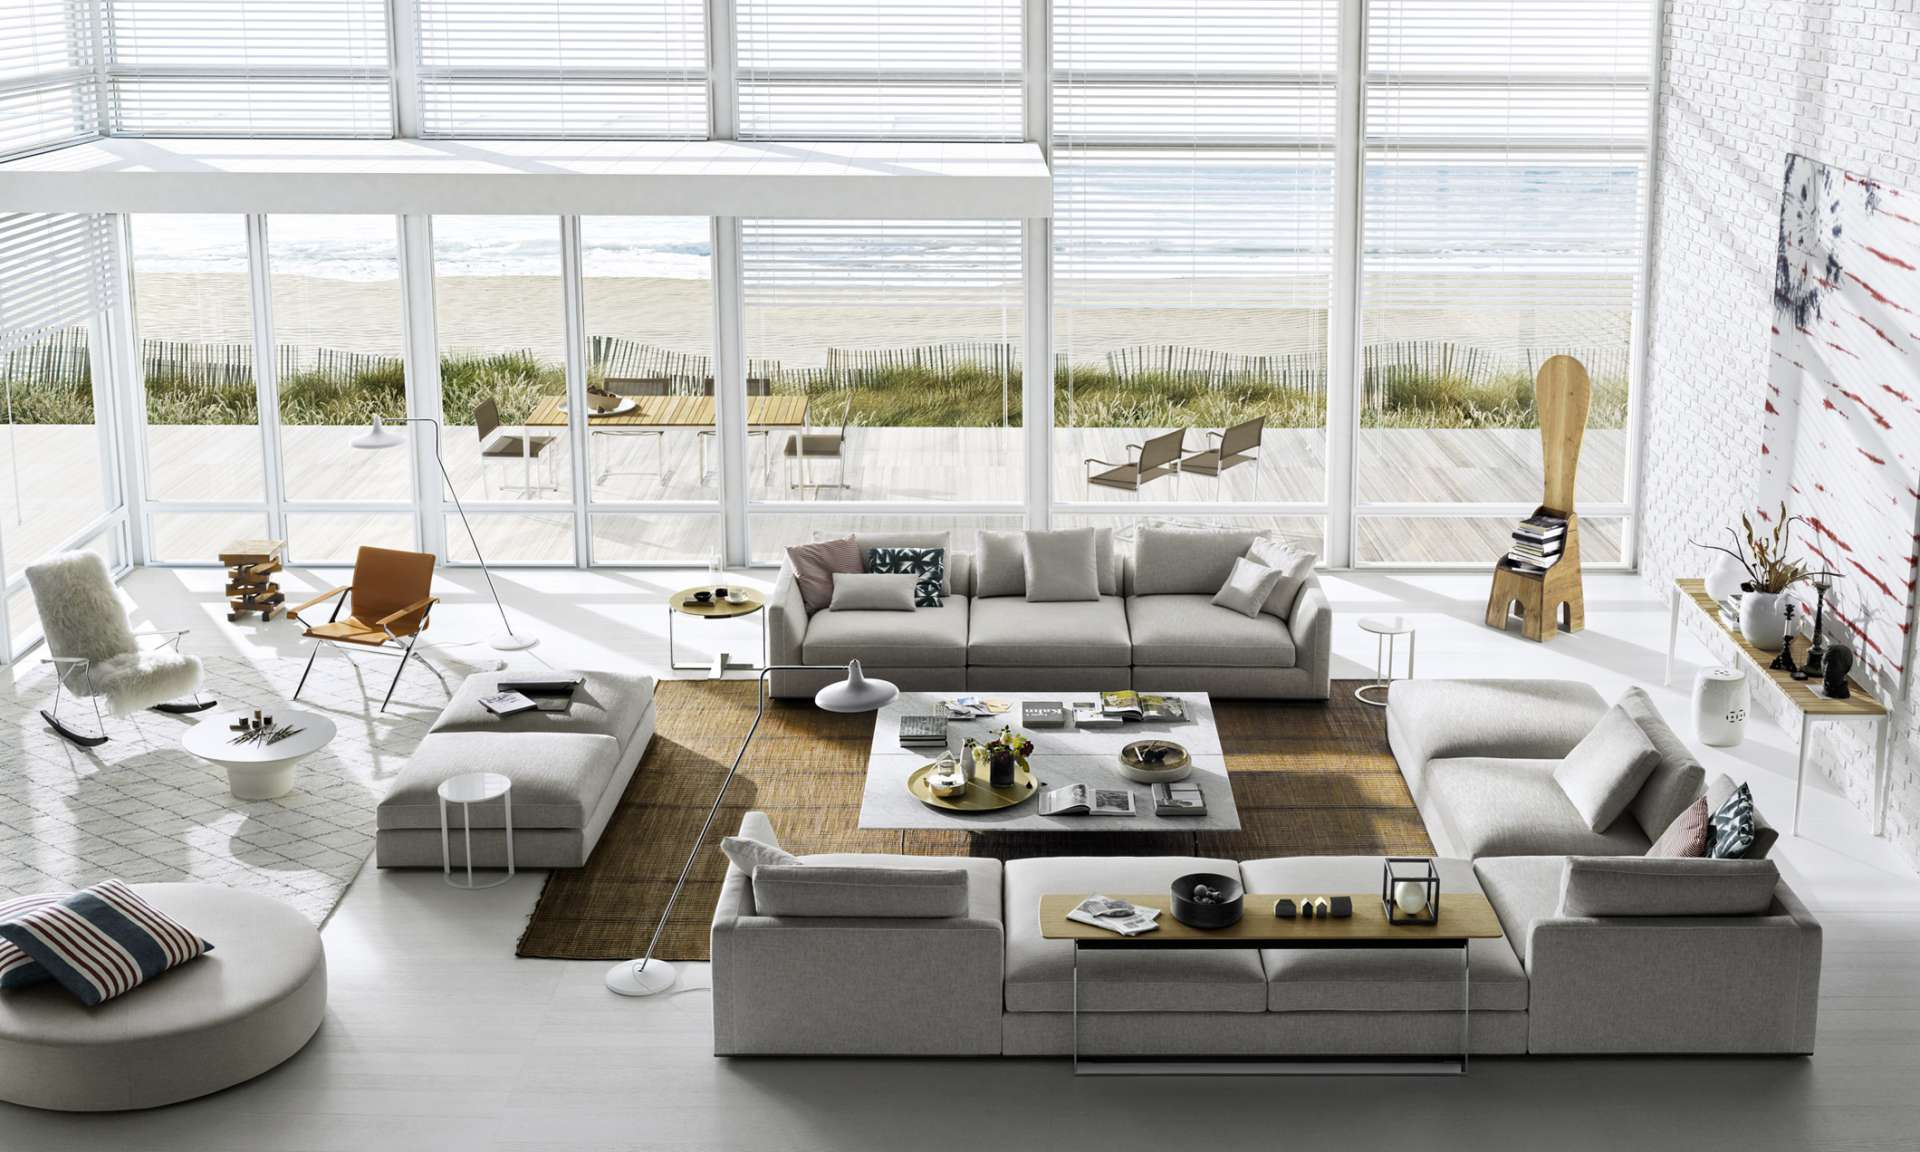 Neutral materials in Contemporary design.